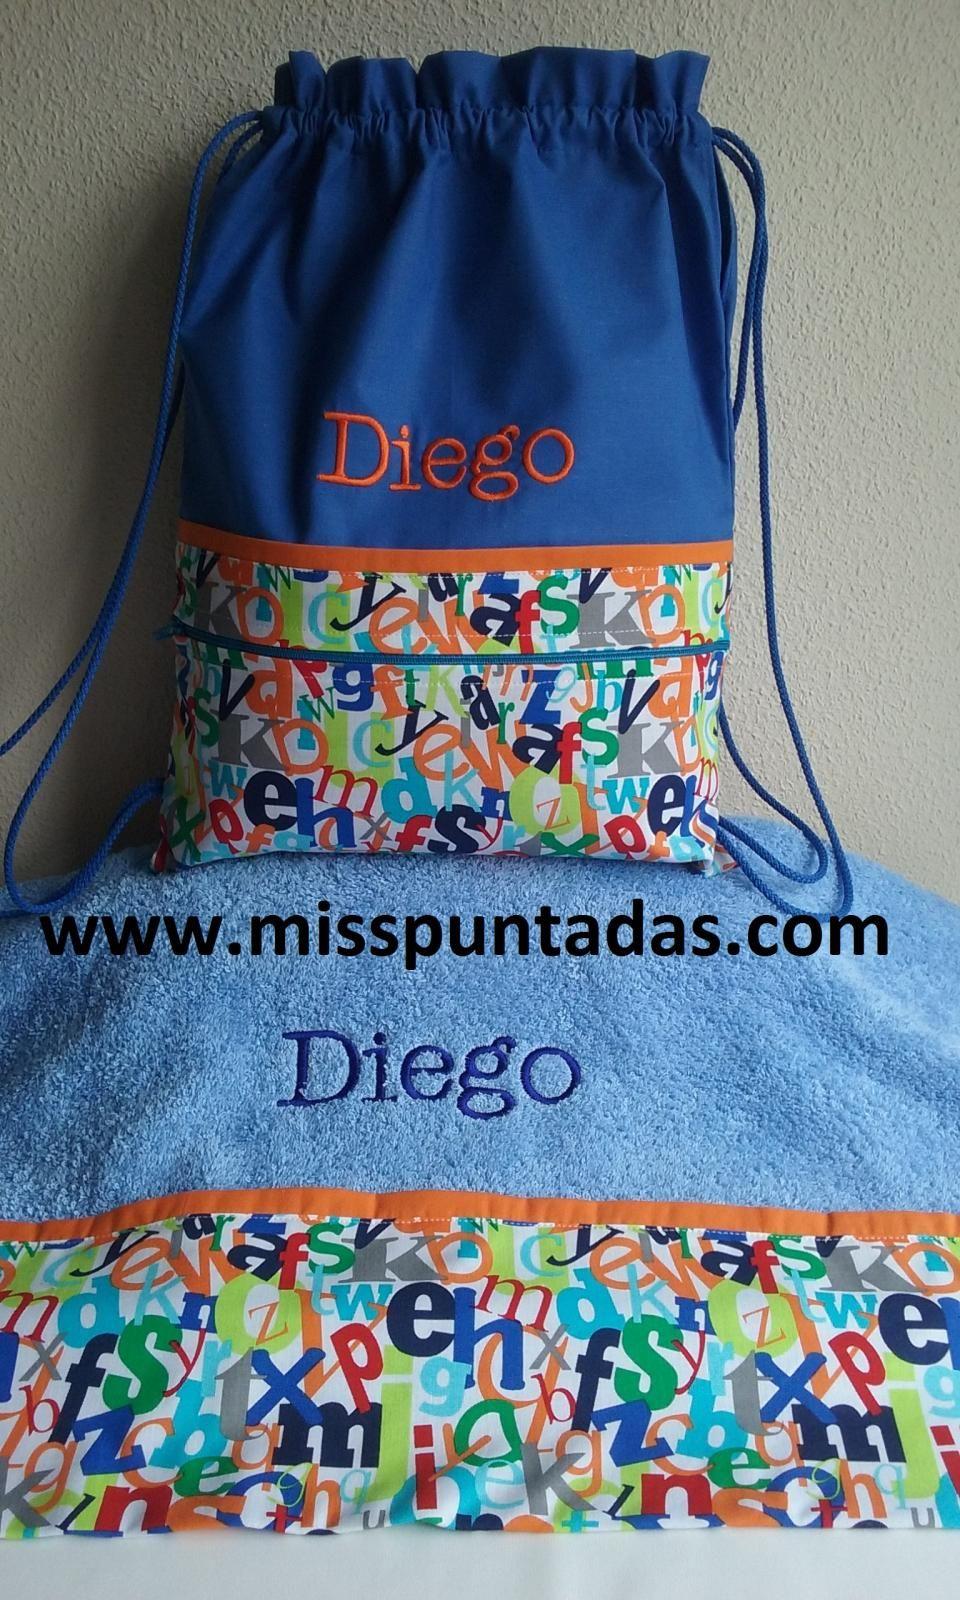 Toalla ducha y bolsa Letras. www.misspuntadas.com